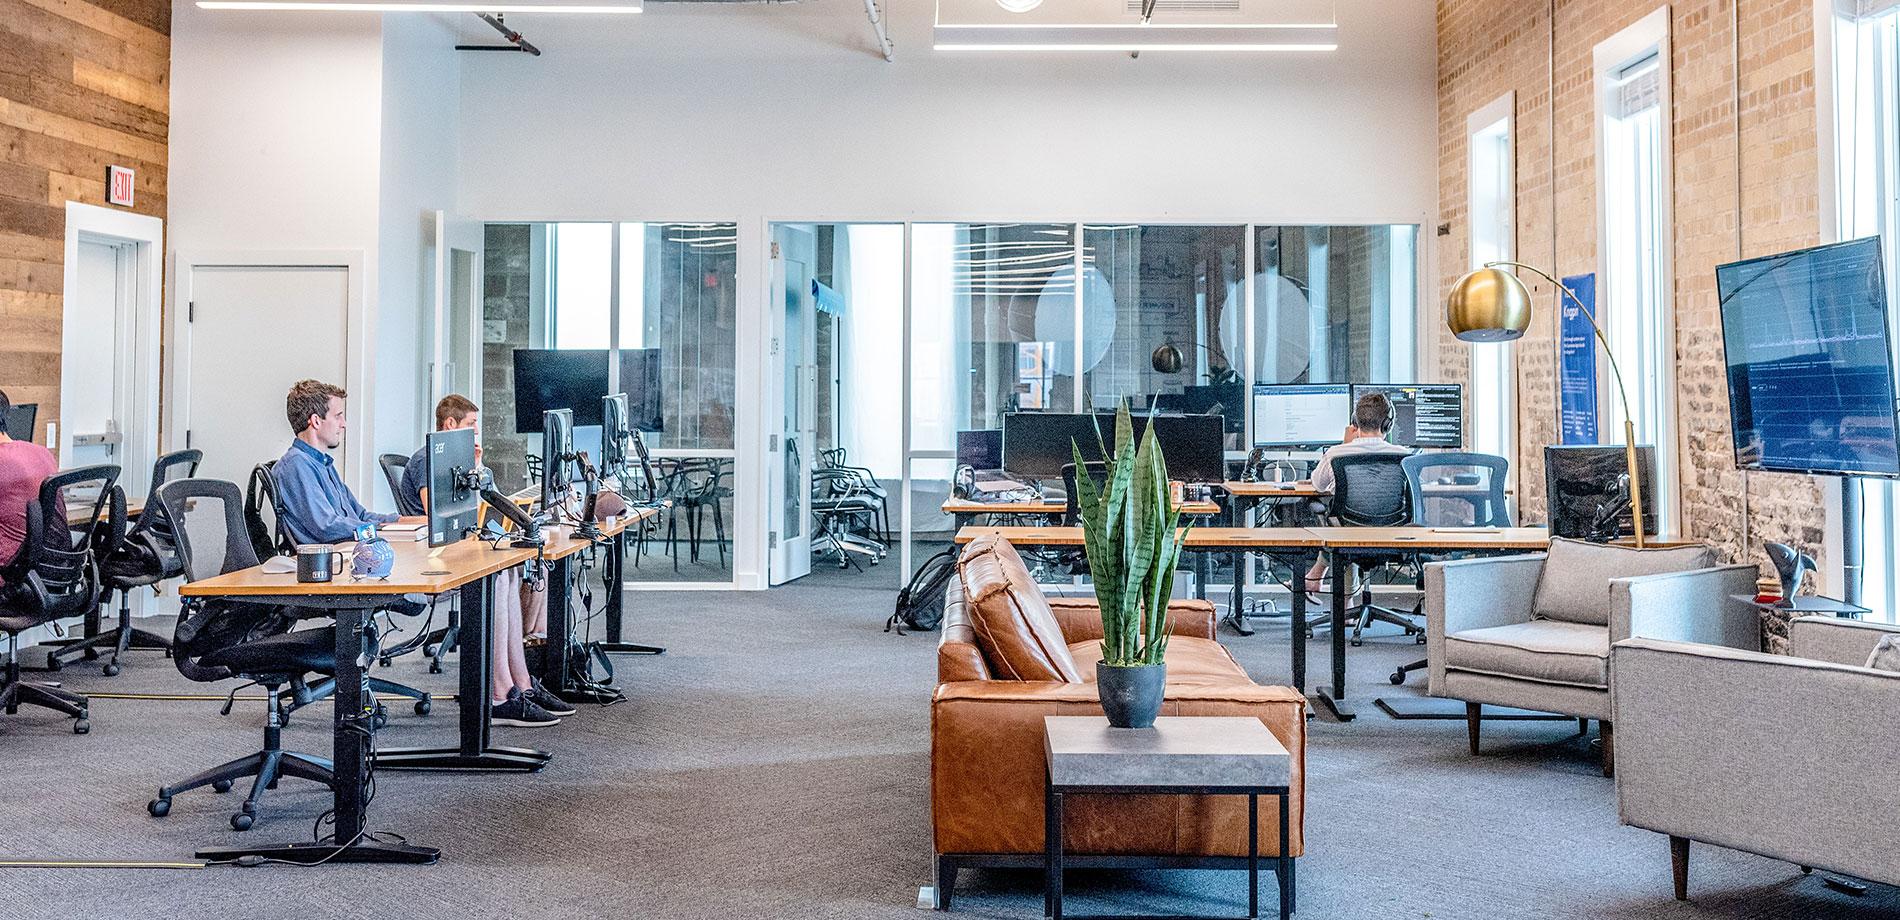 Workplace, Facebook, Empresas